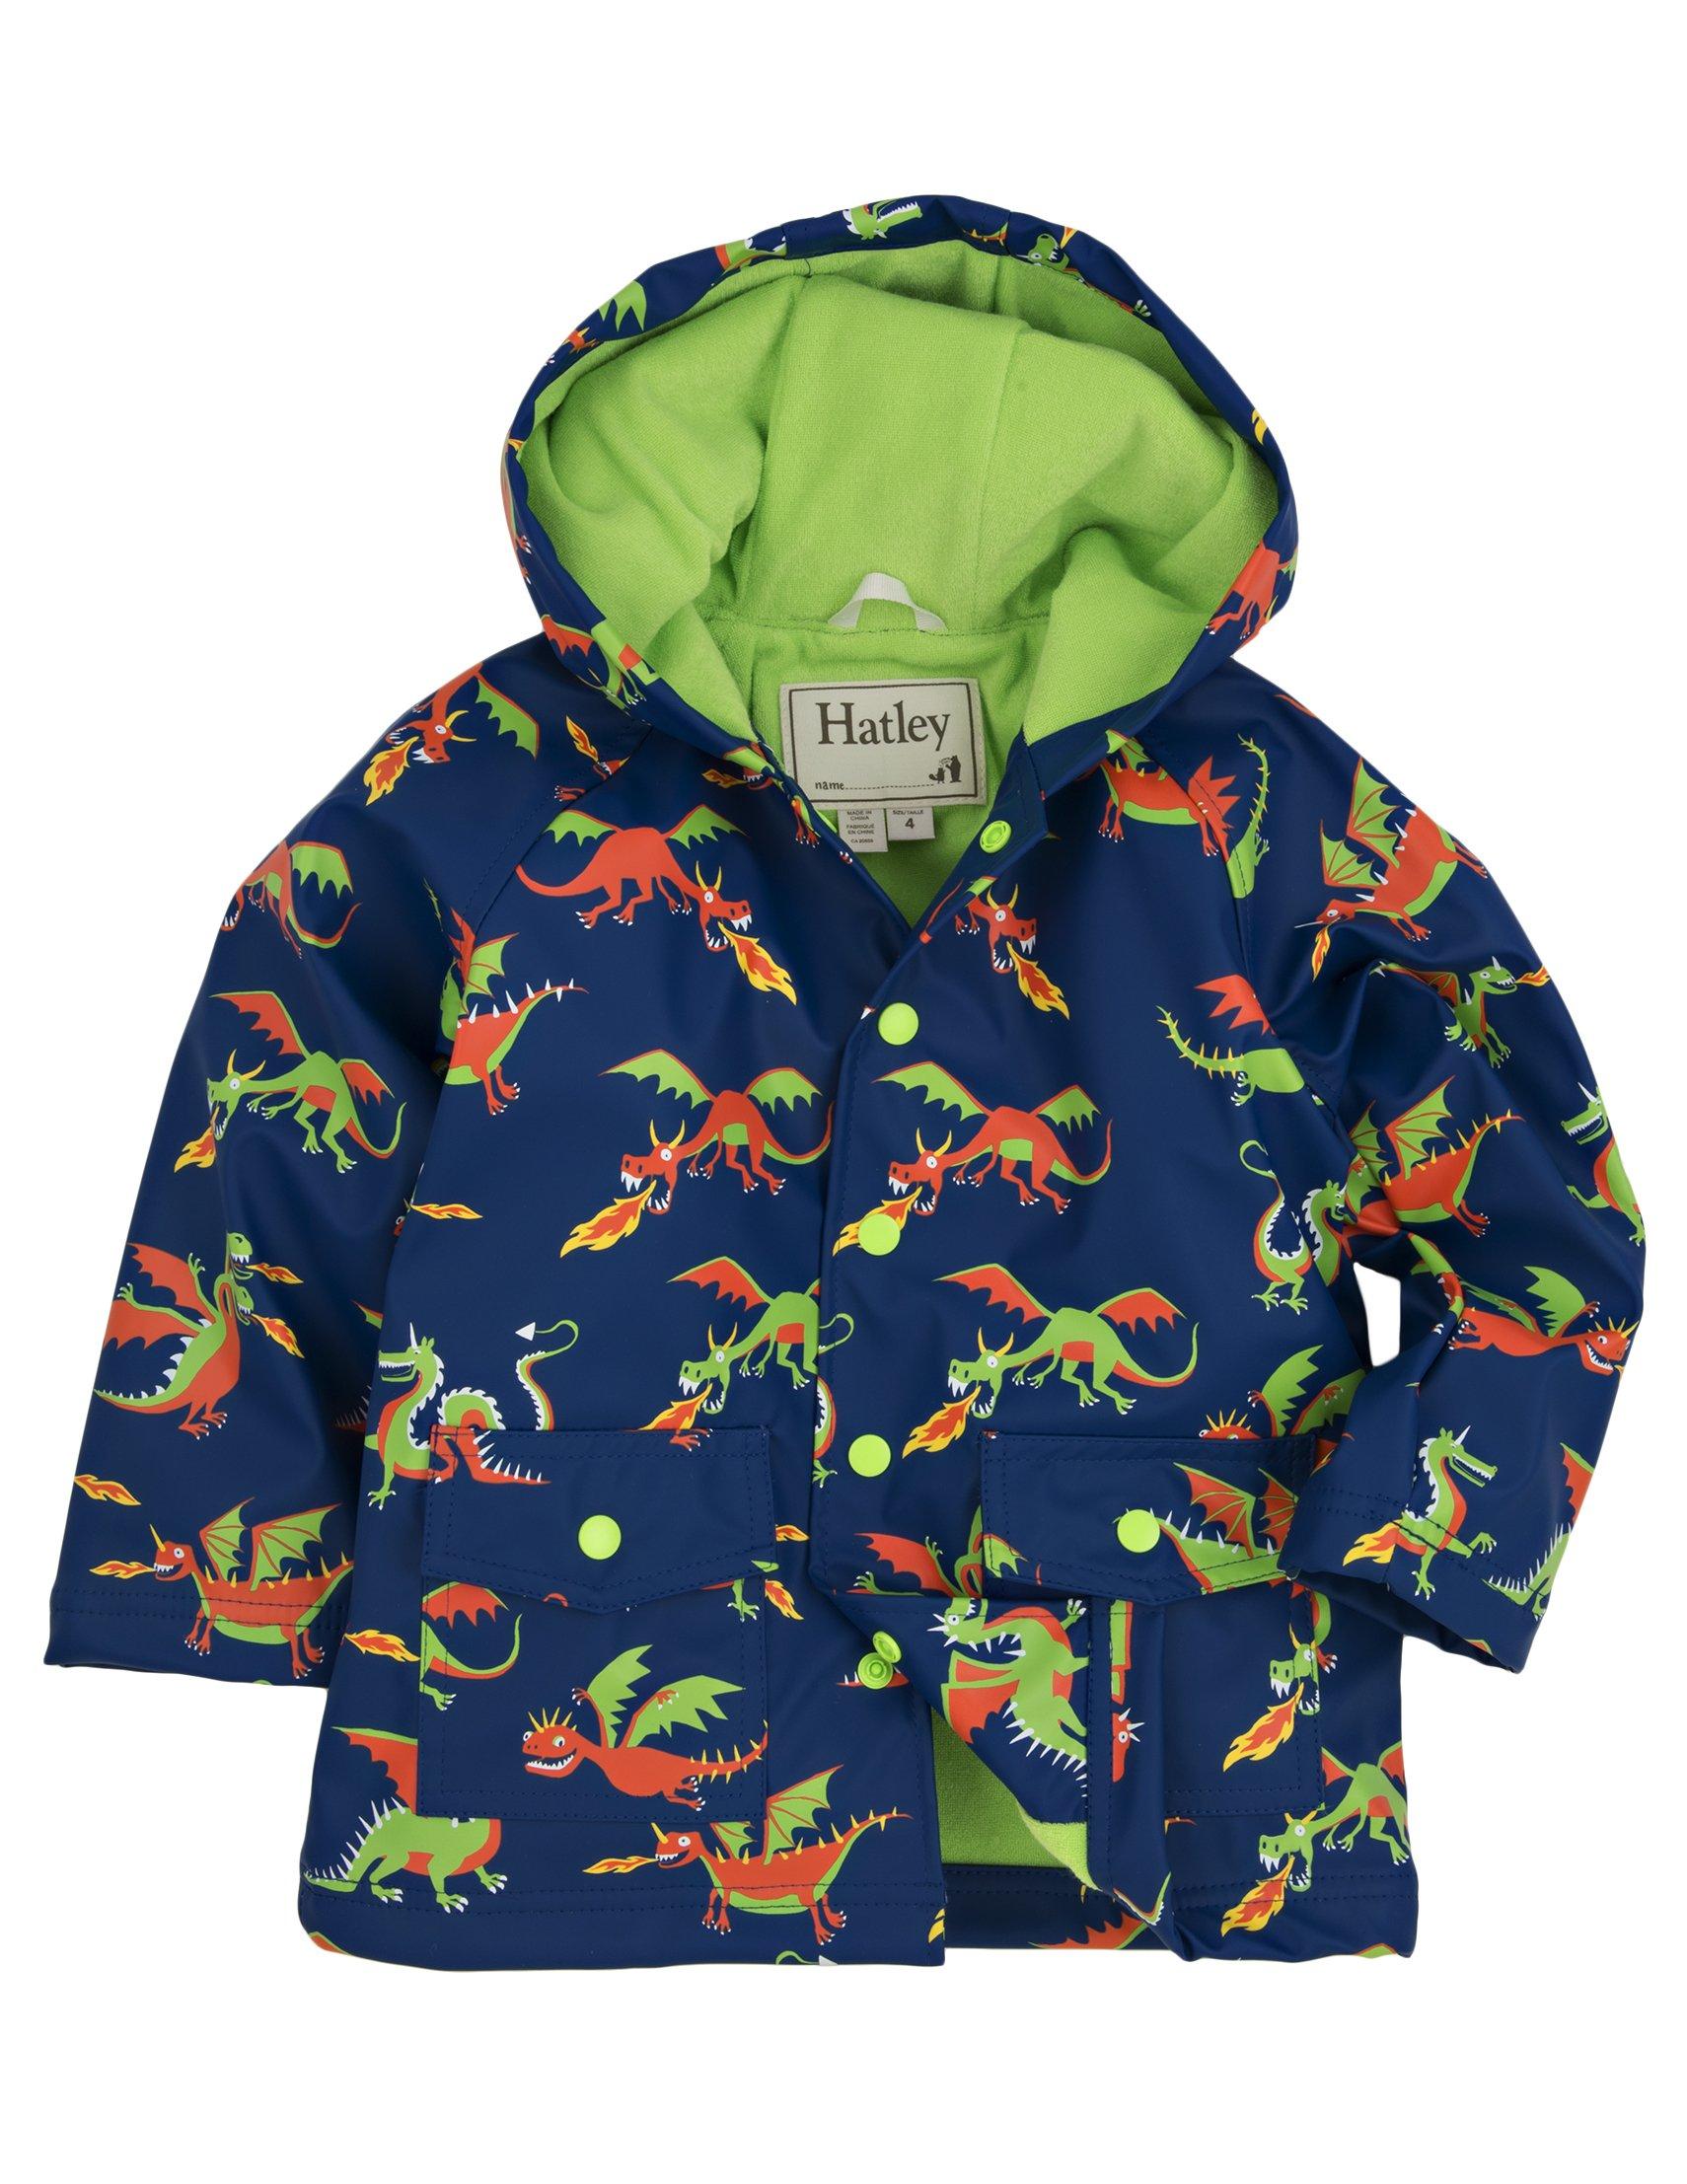 Hatley Little Boys' Rain Coat Dragons, Blue Dragons, 4 by Hatley